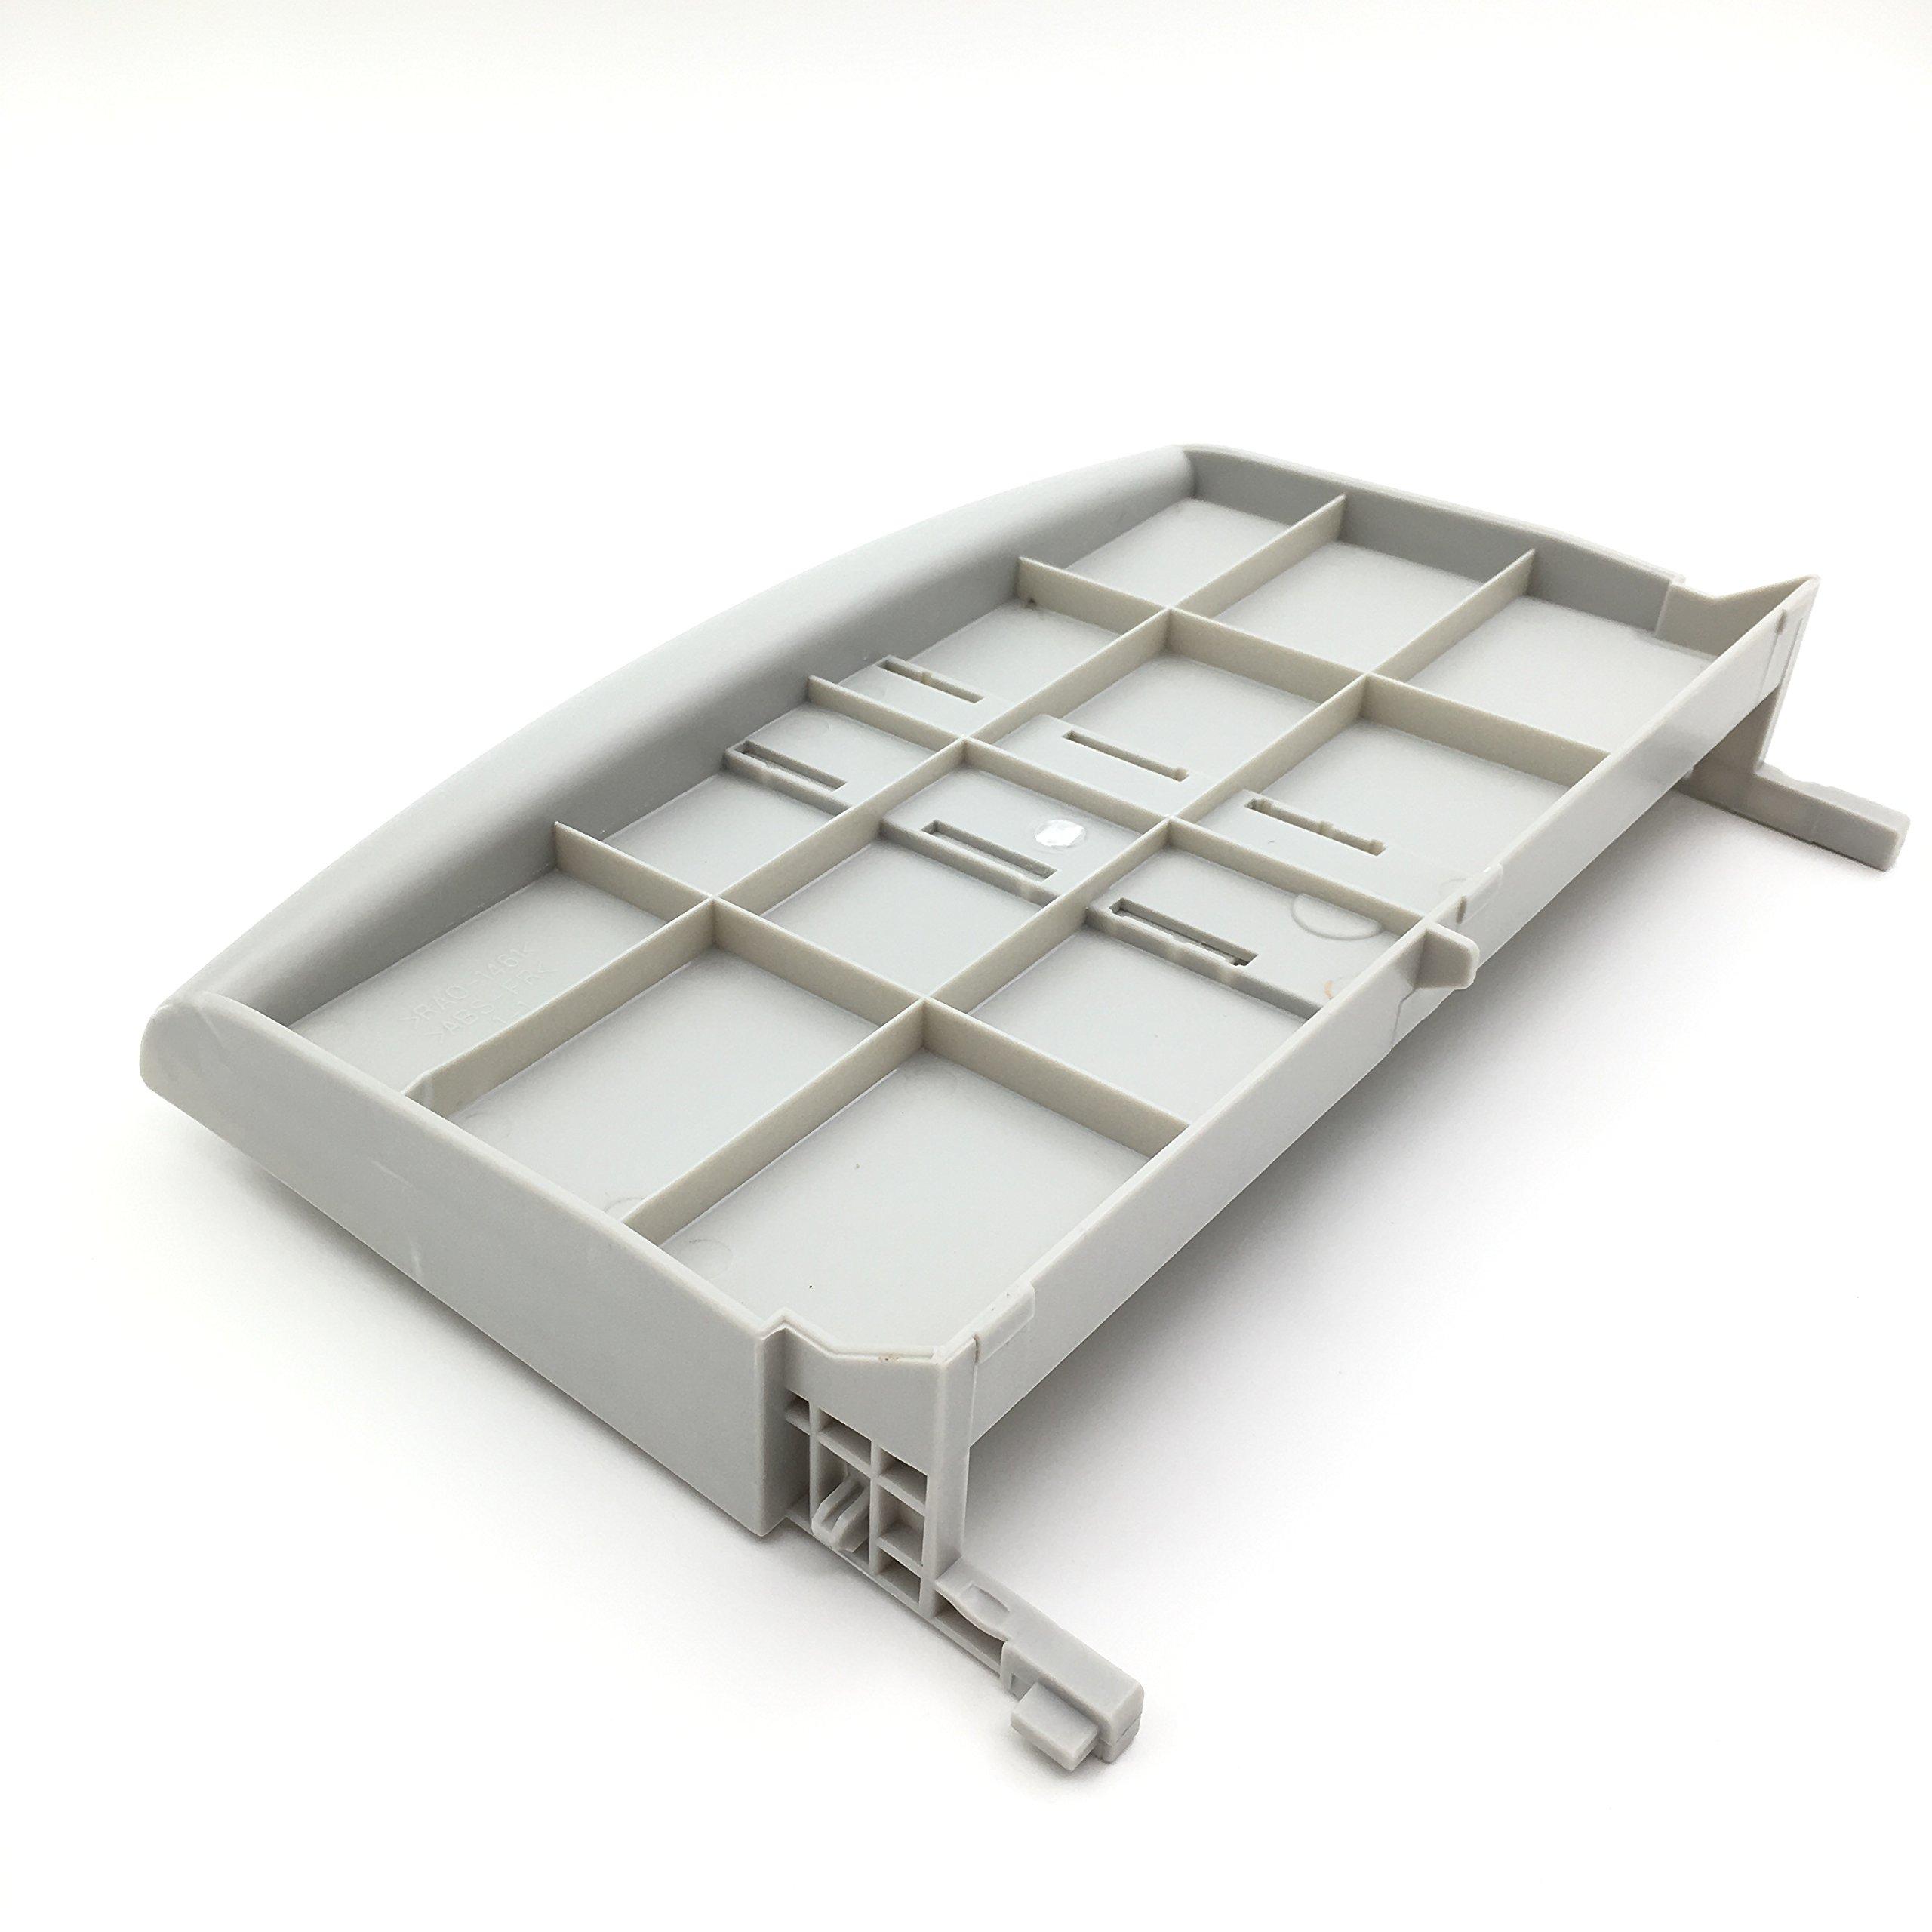 OKLILI RG0-1121-000 RG0-1013-000 RM1-0553 RM1-0554 Paper Input Tray for HP 1000 1200 1220 1300 1150 3300 3310 3320 3330 3380 by OKLILI (Image #4)